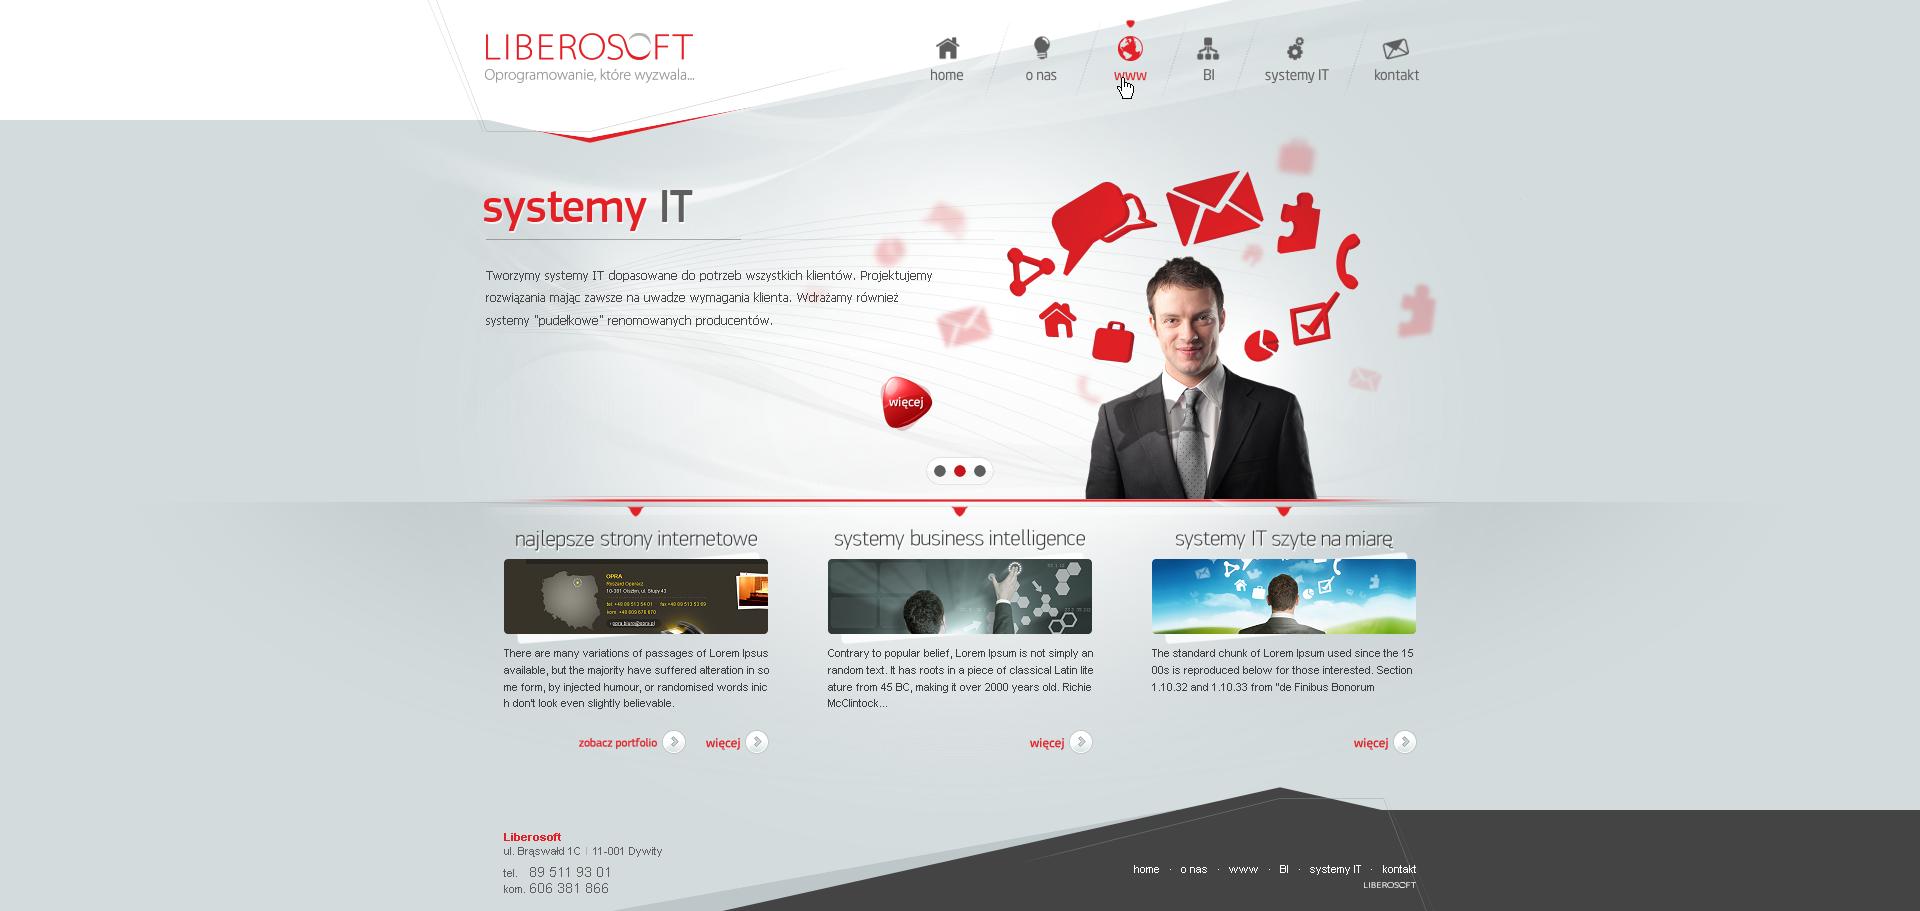 Liberosoft by coy2k